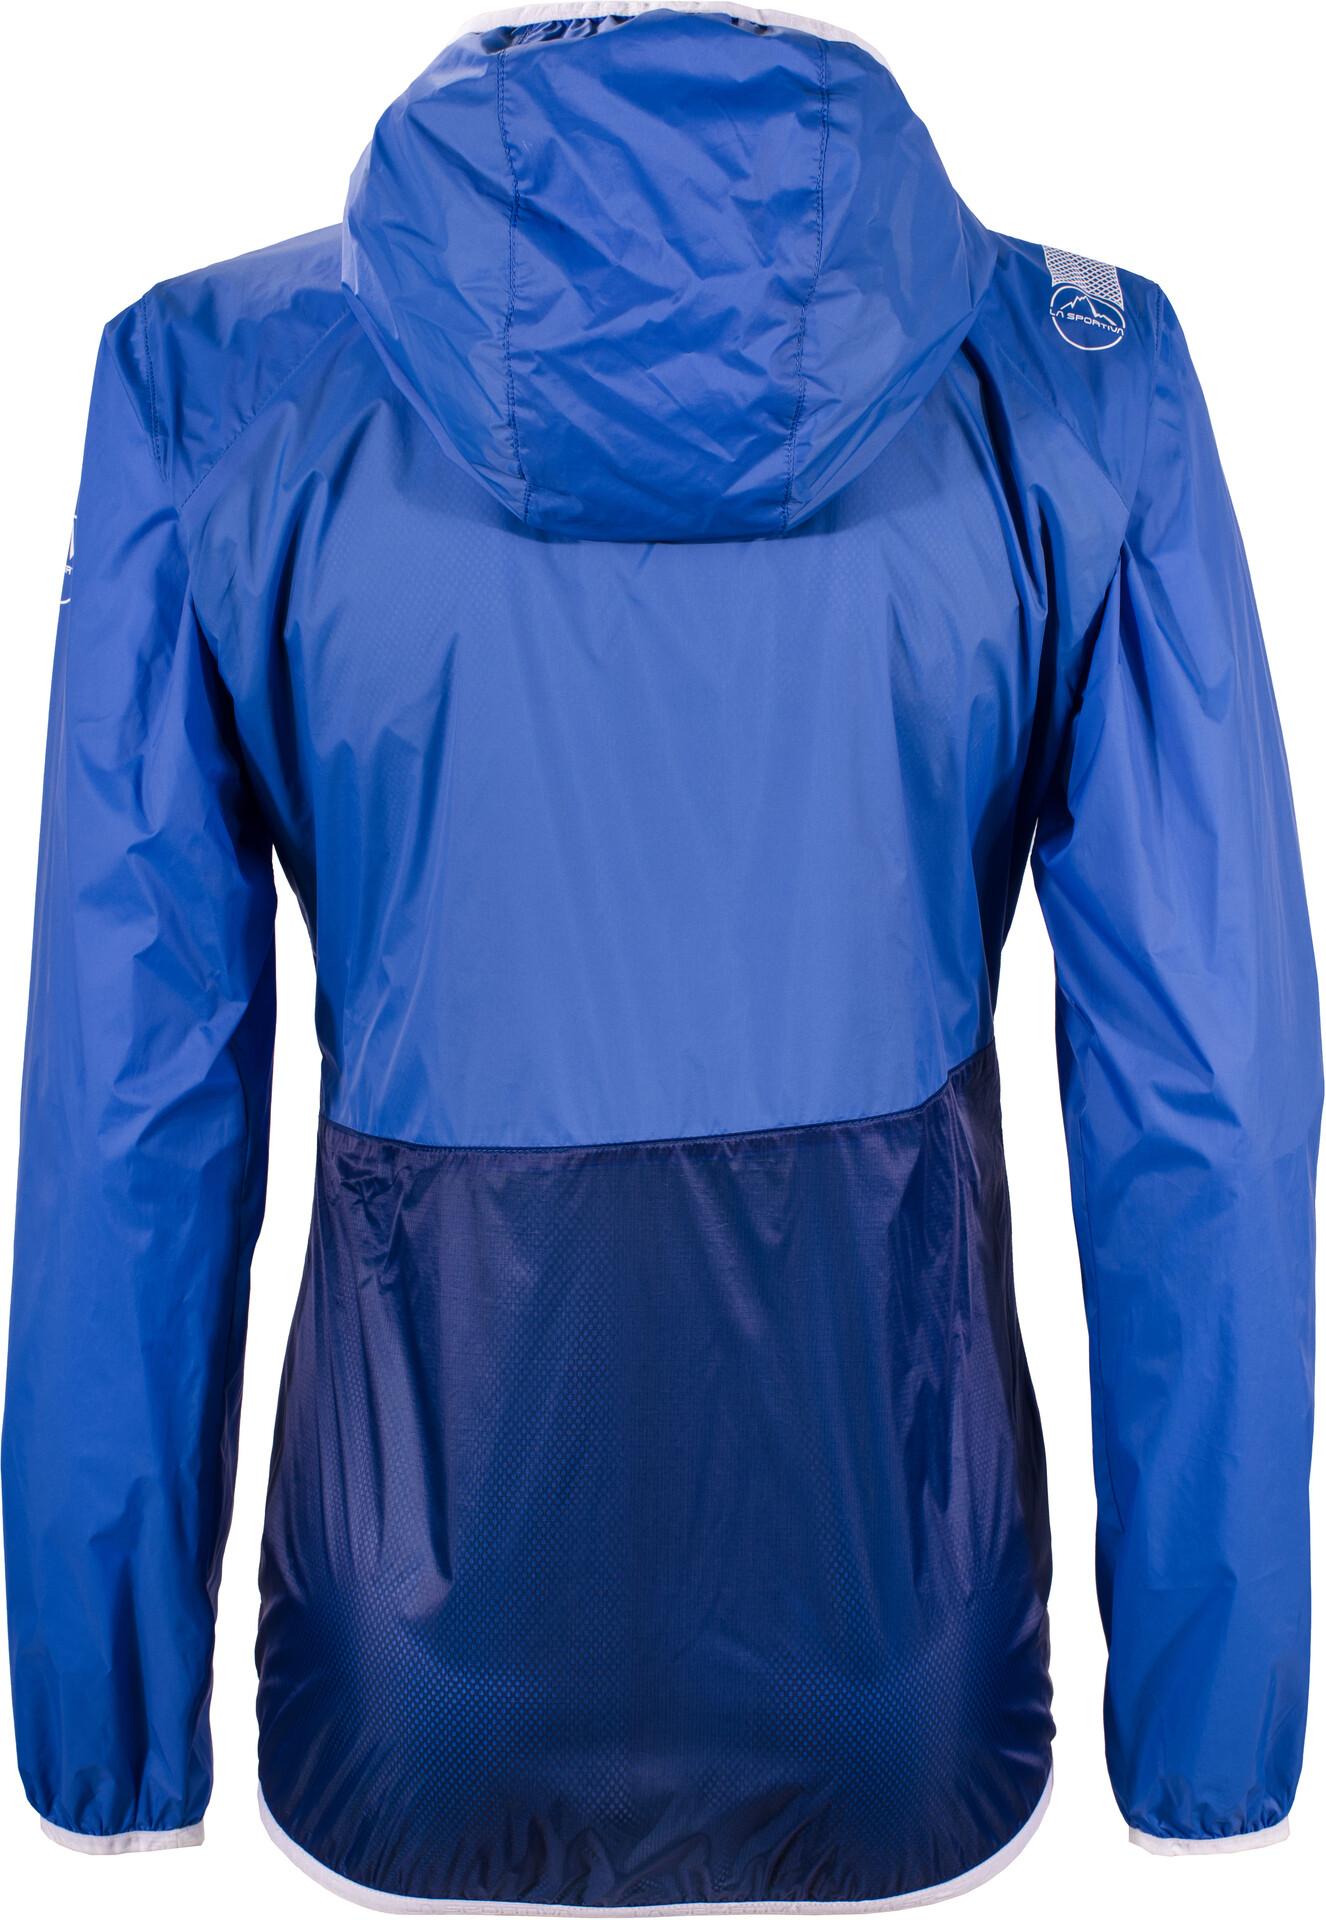 La Sportiva Creek Jas Dames, cobalt bluemarine blue